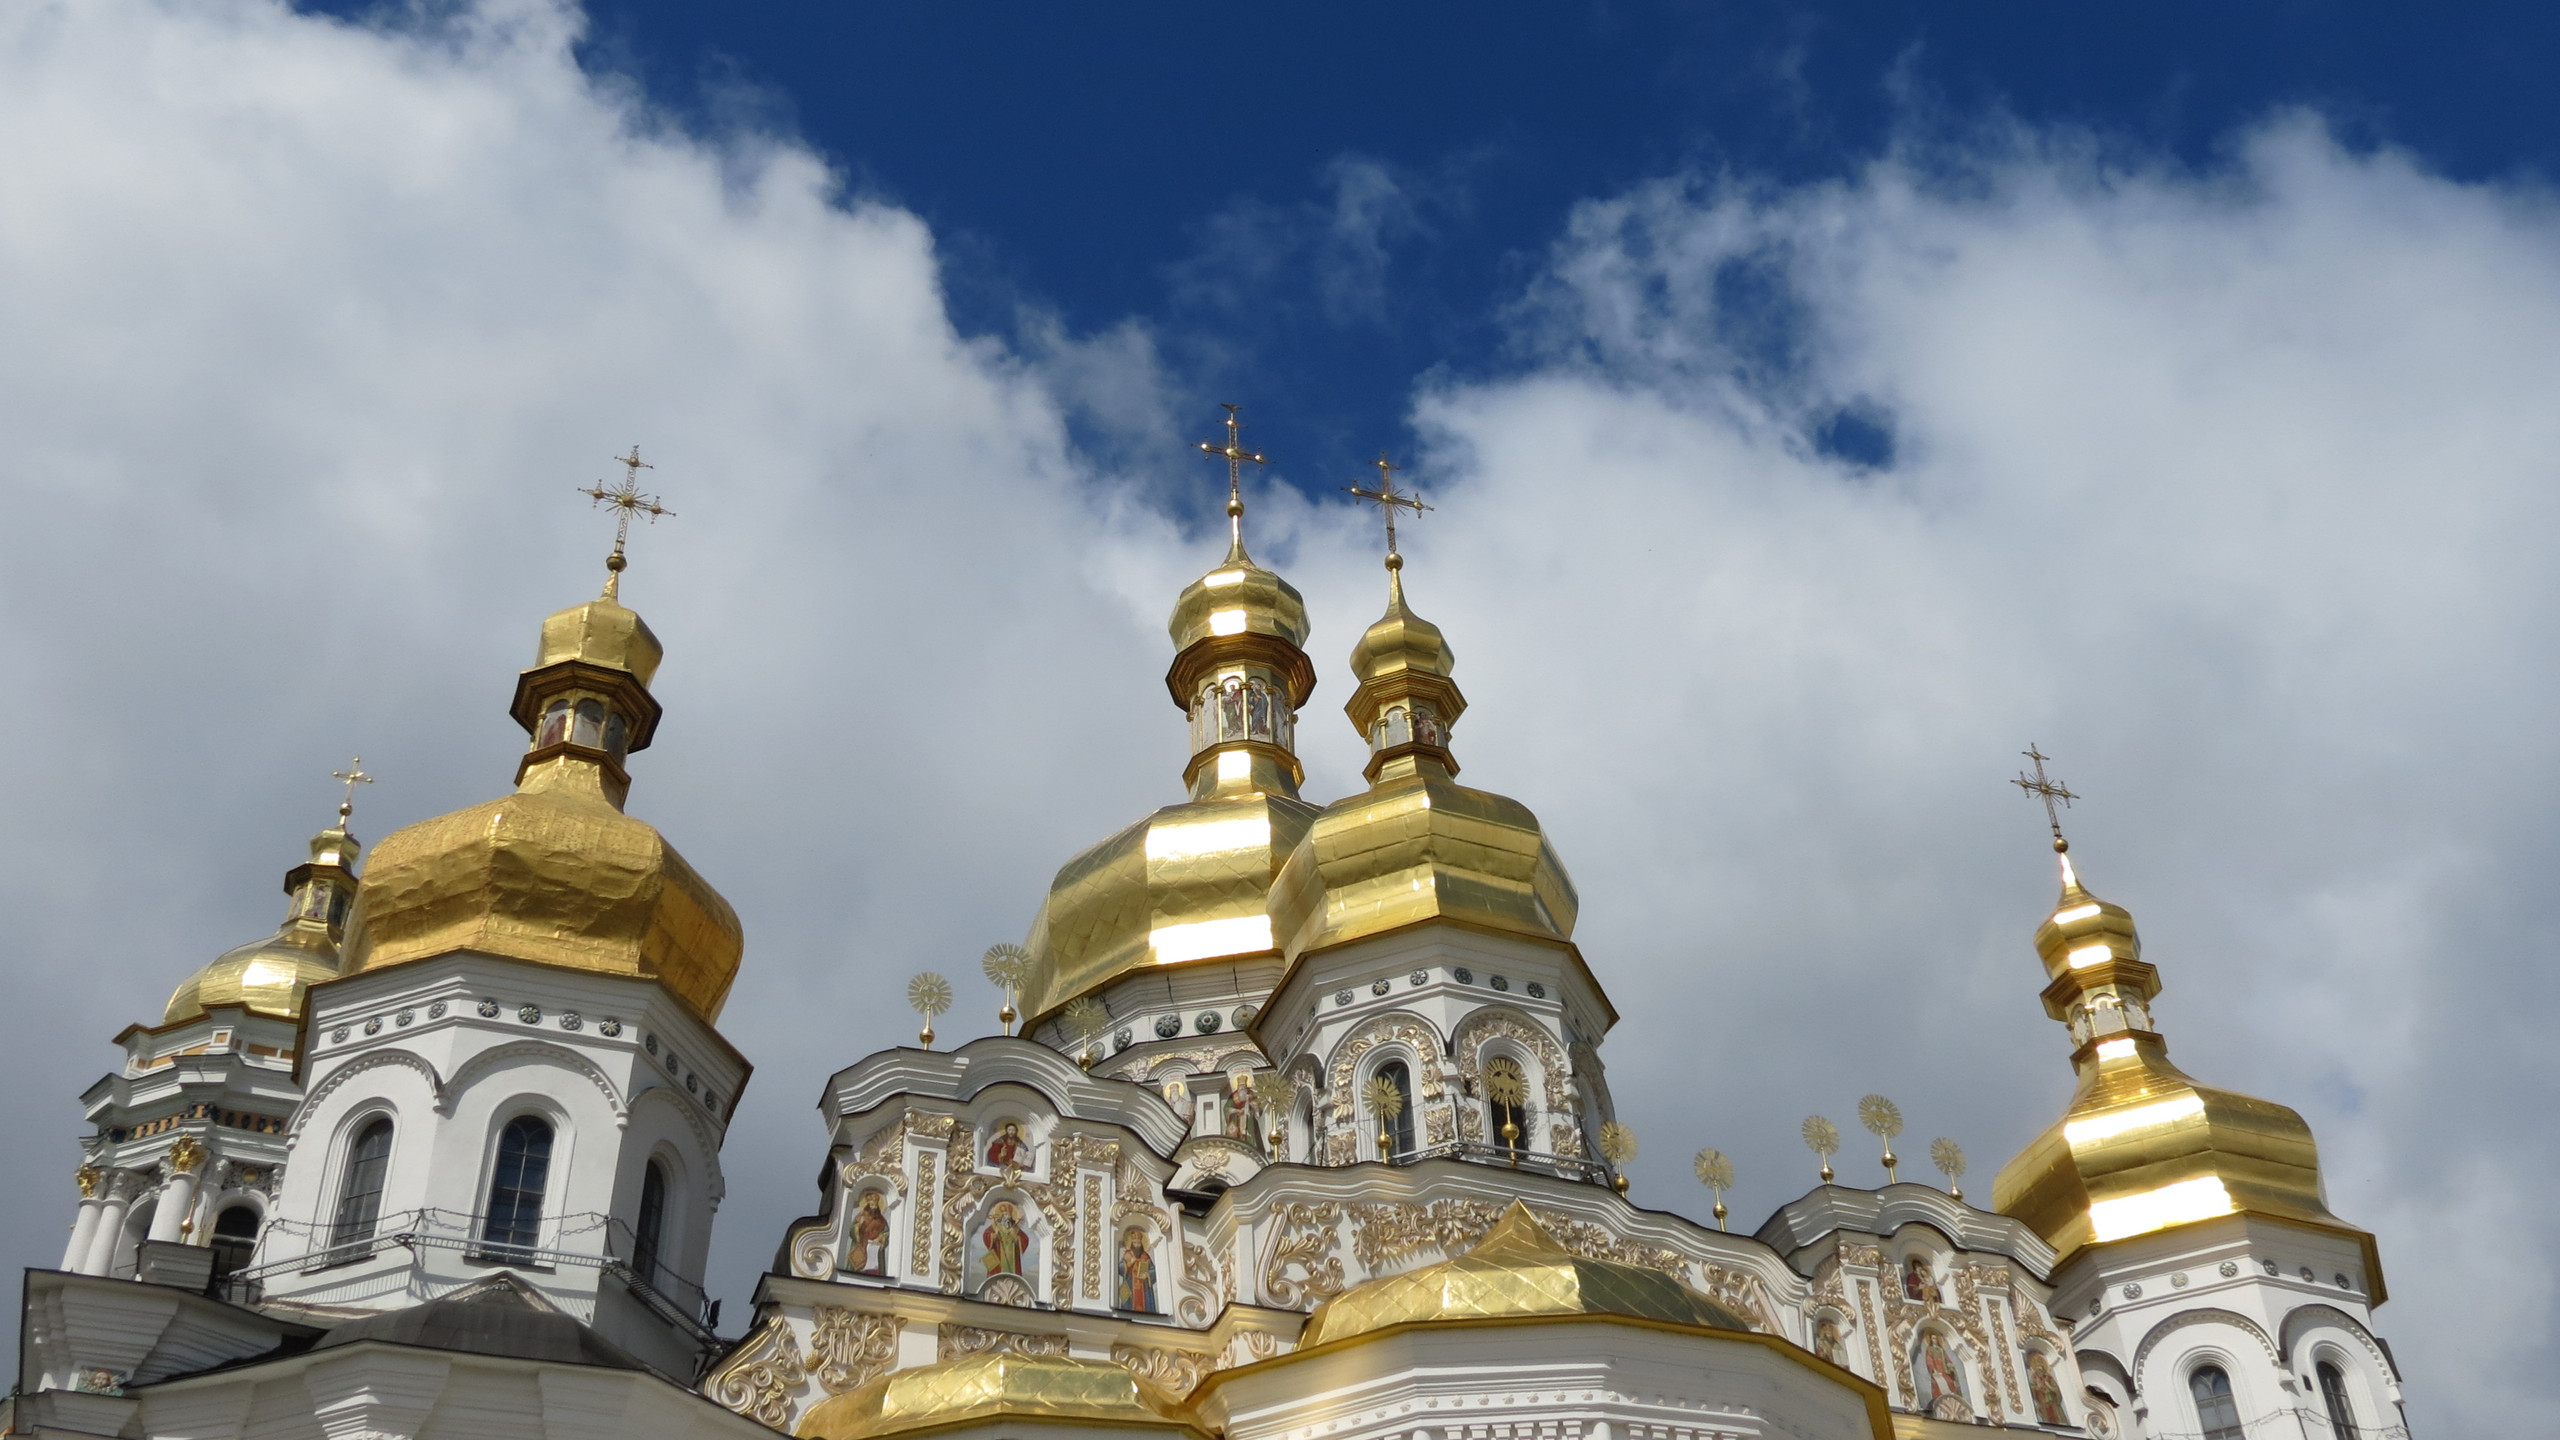 337 - Lavra, Kyiv